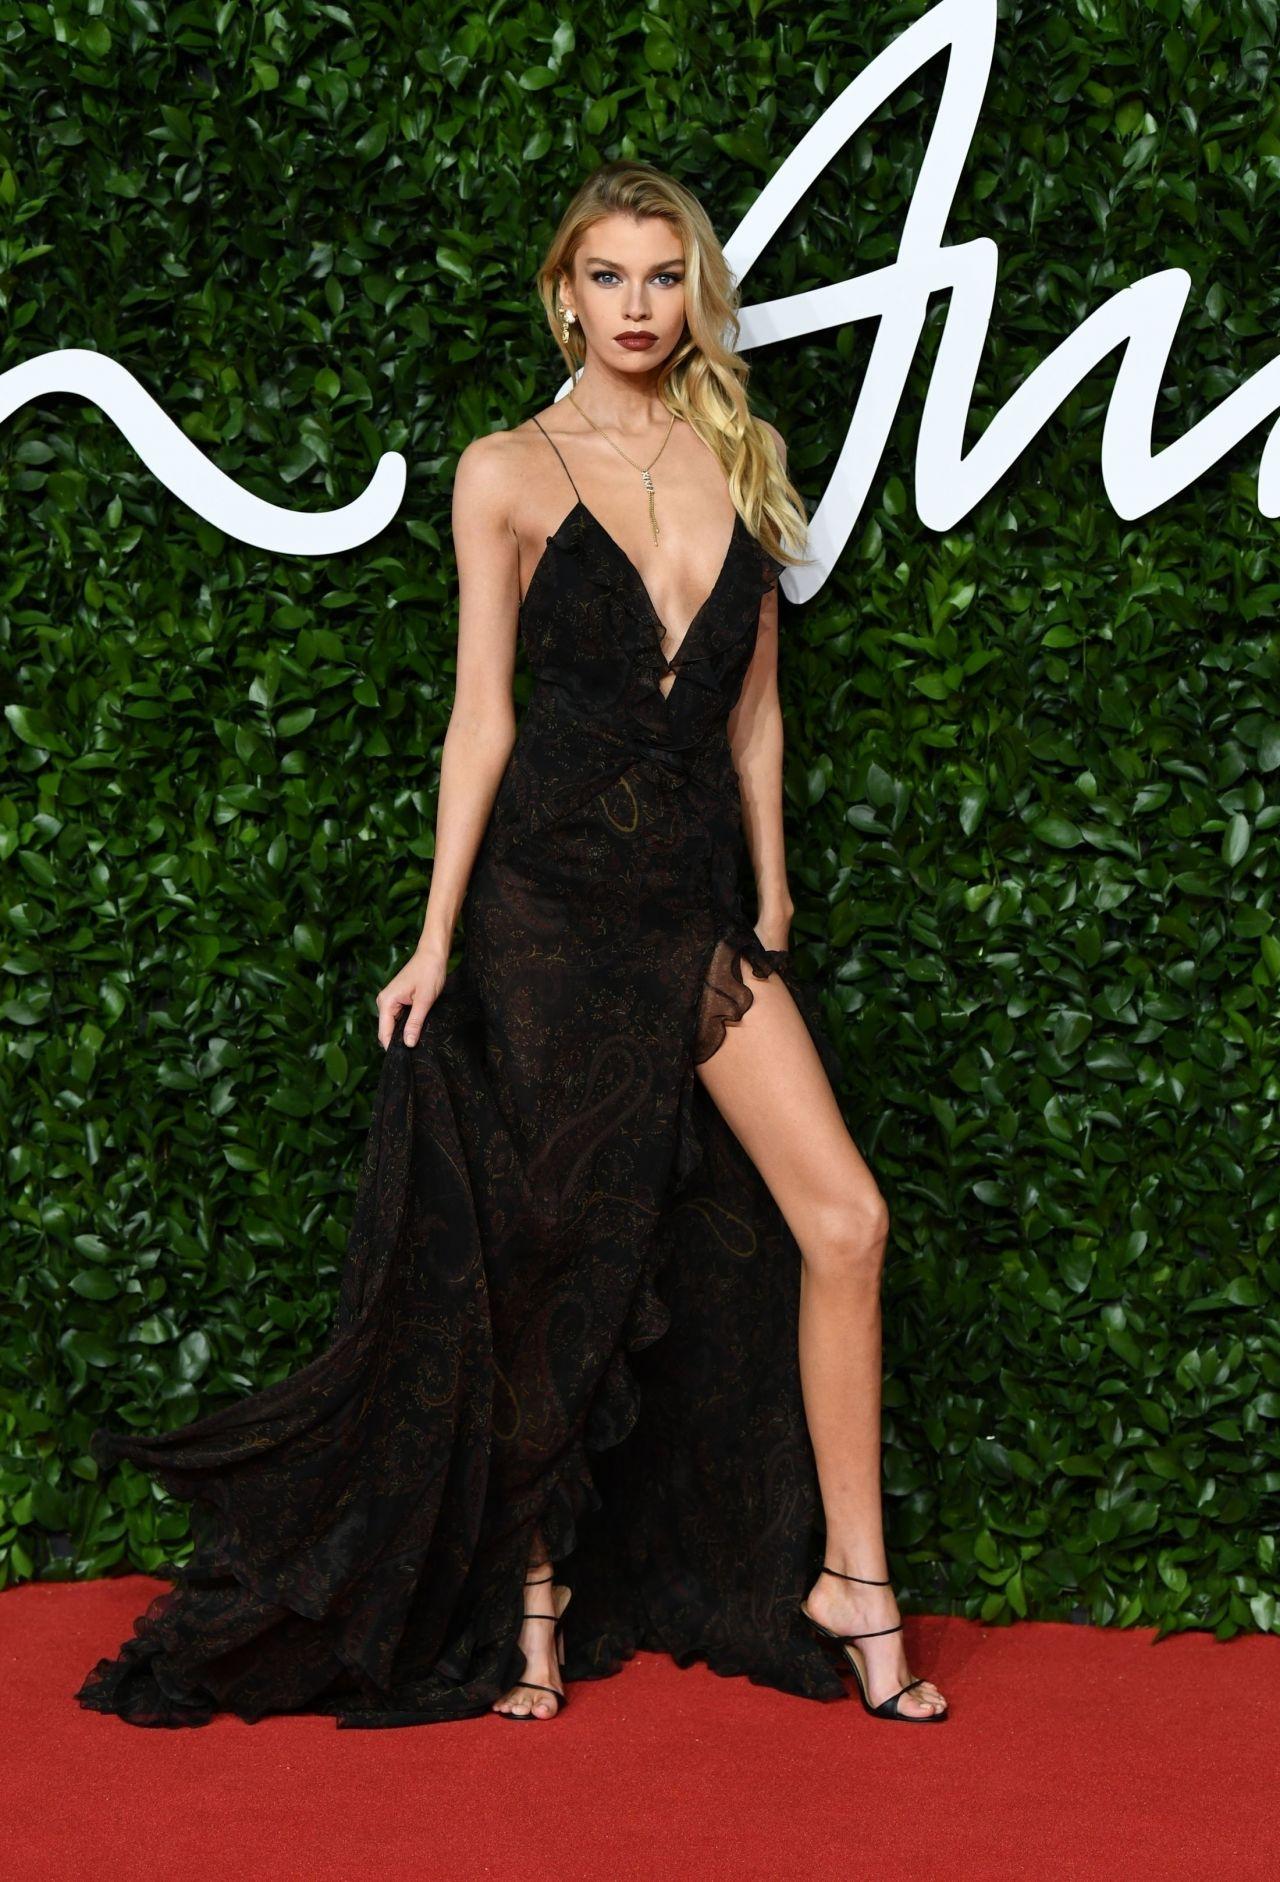 stella-maxwell-in-etro-2019-british-fashion-council-awards